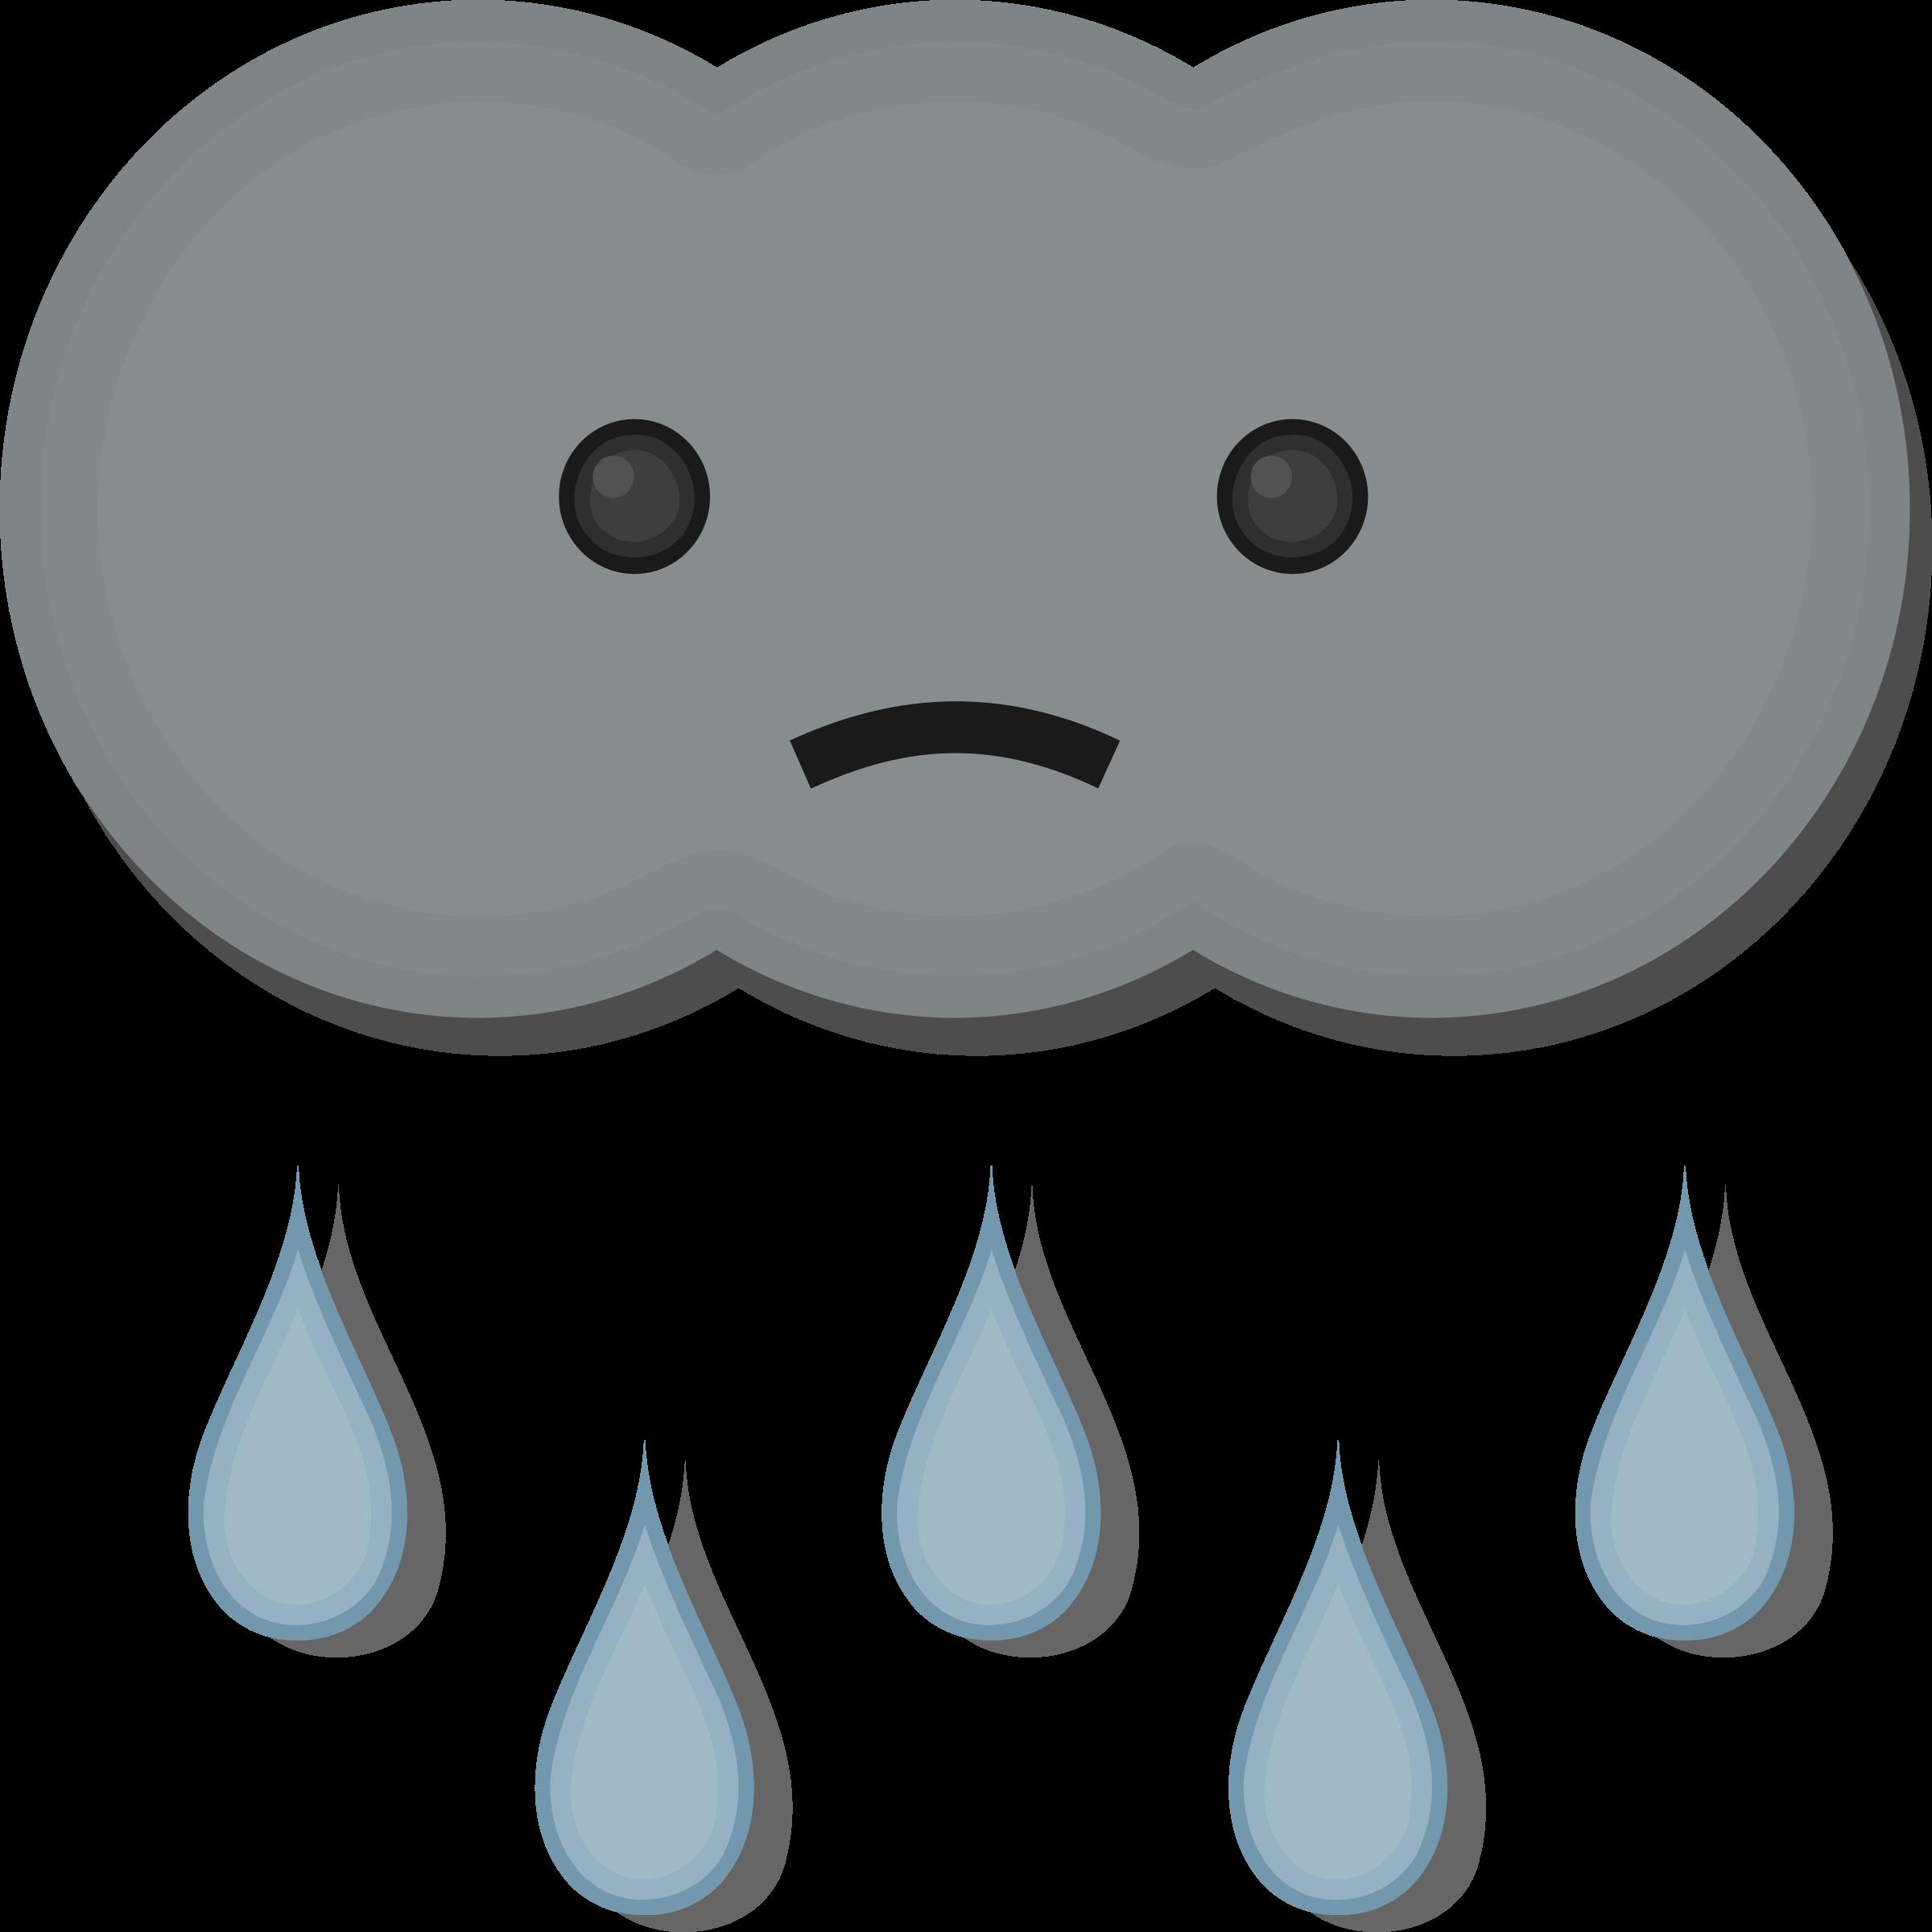 Sad little cloud big. Clouds clipart pdf